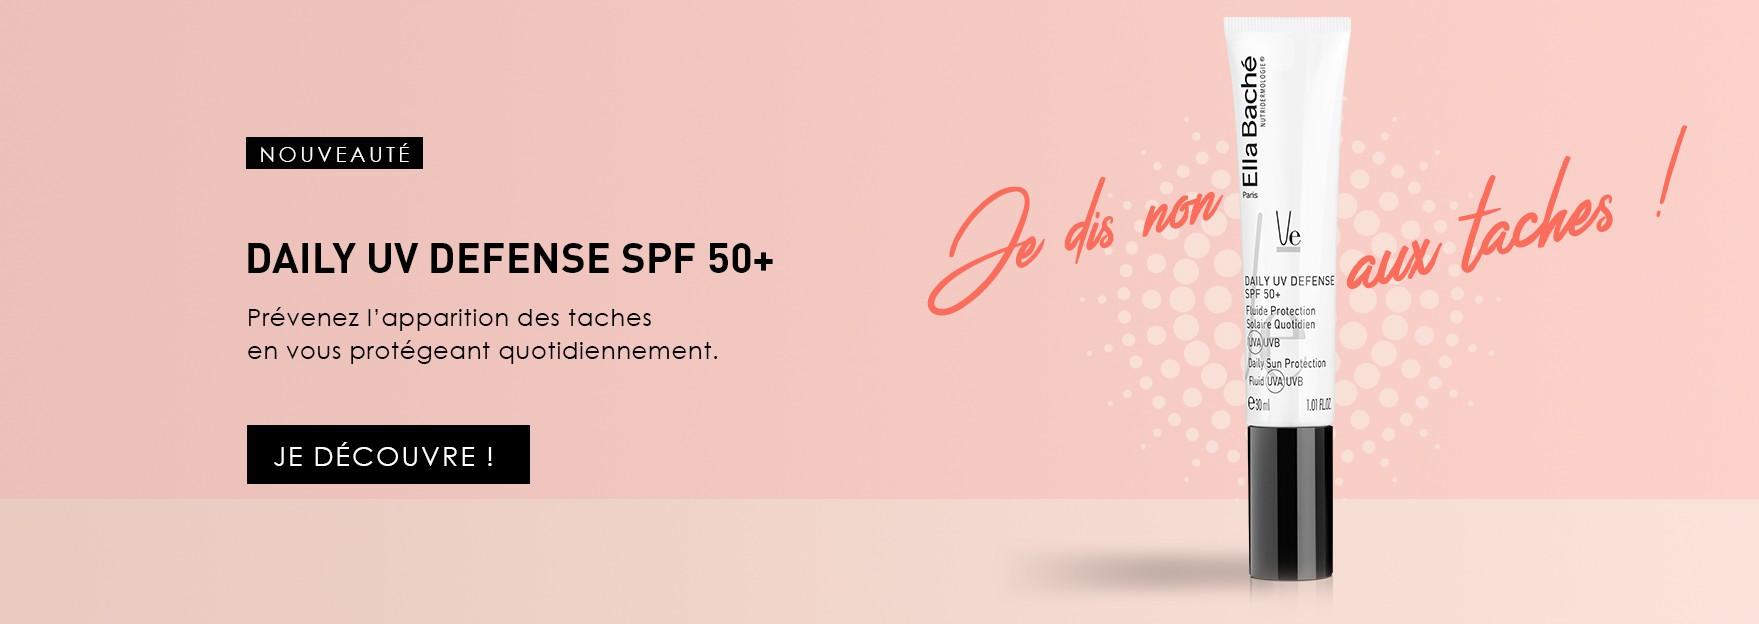 Nouveau : Fluide Daily UV Defense SPF 50+